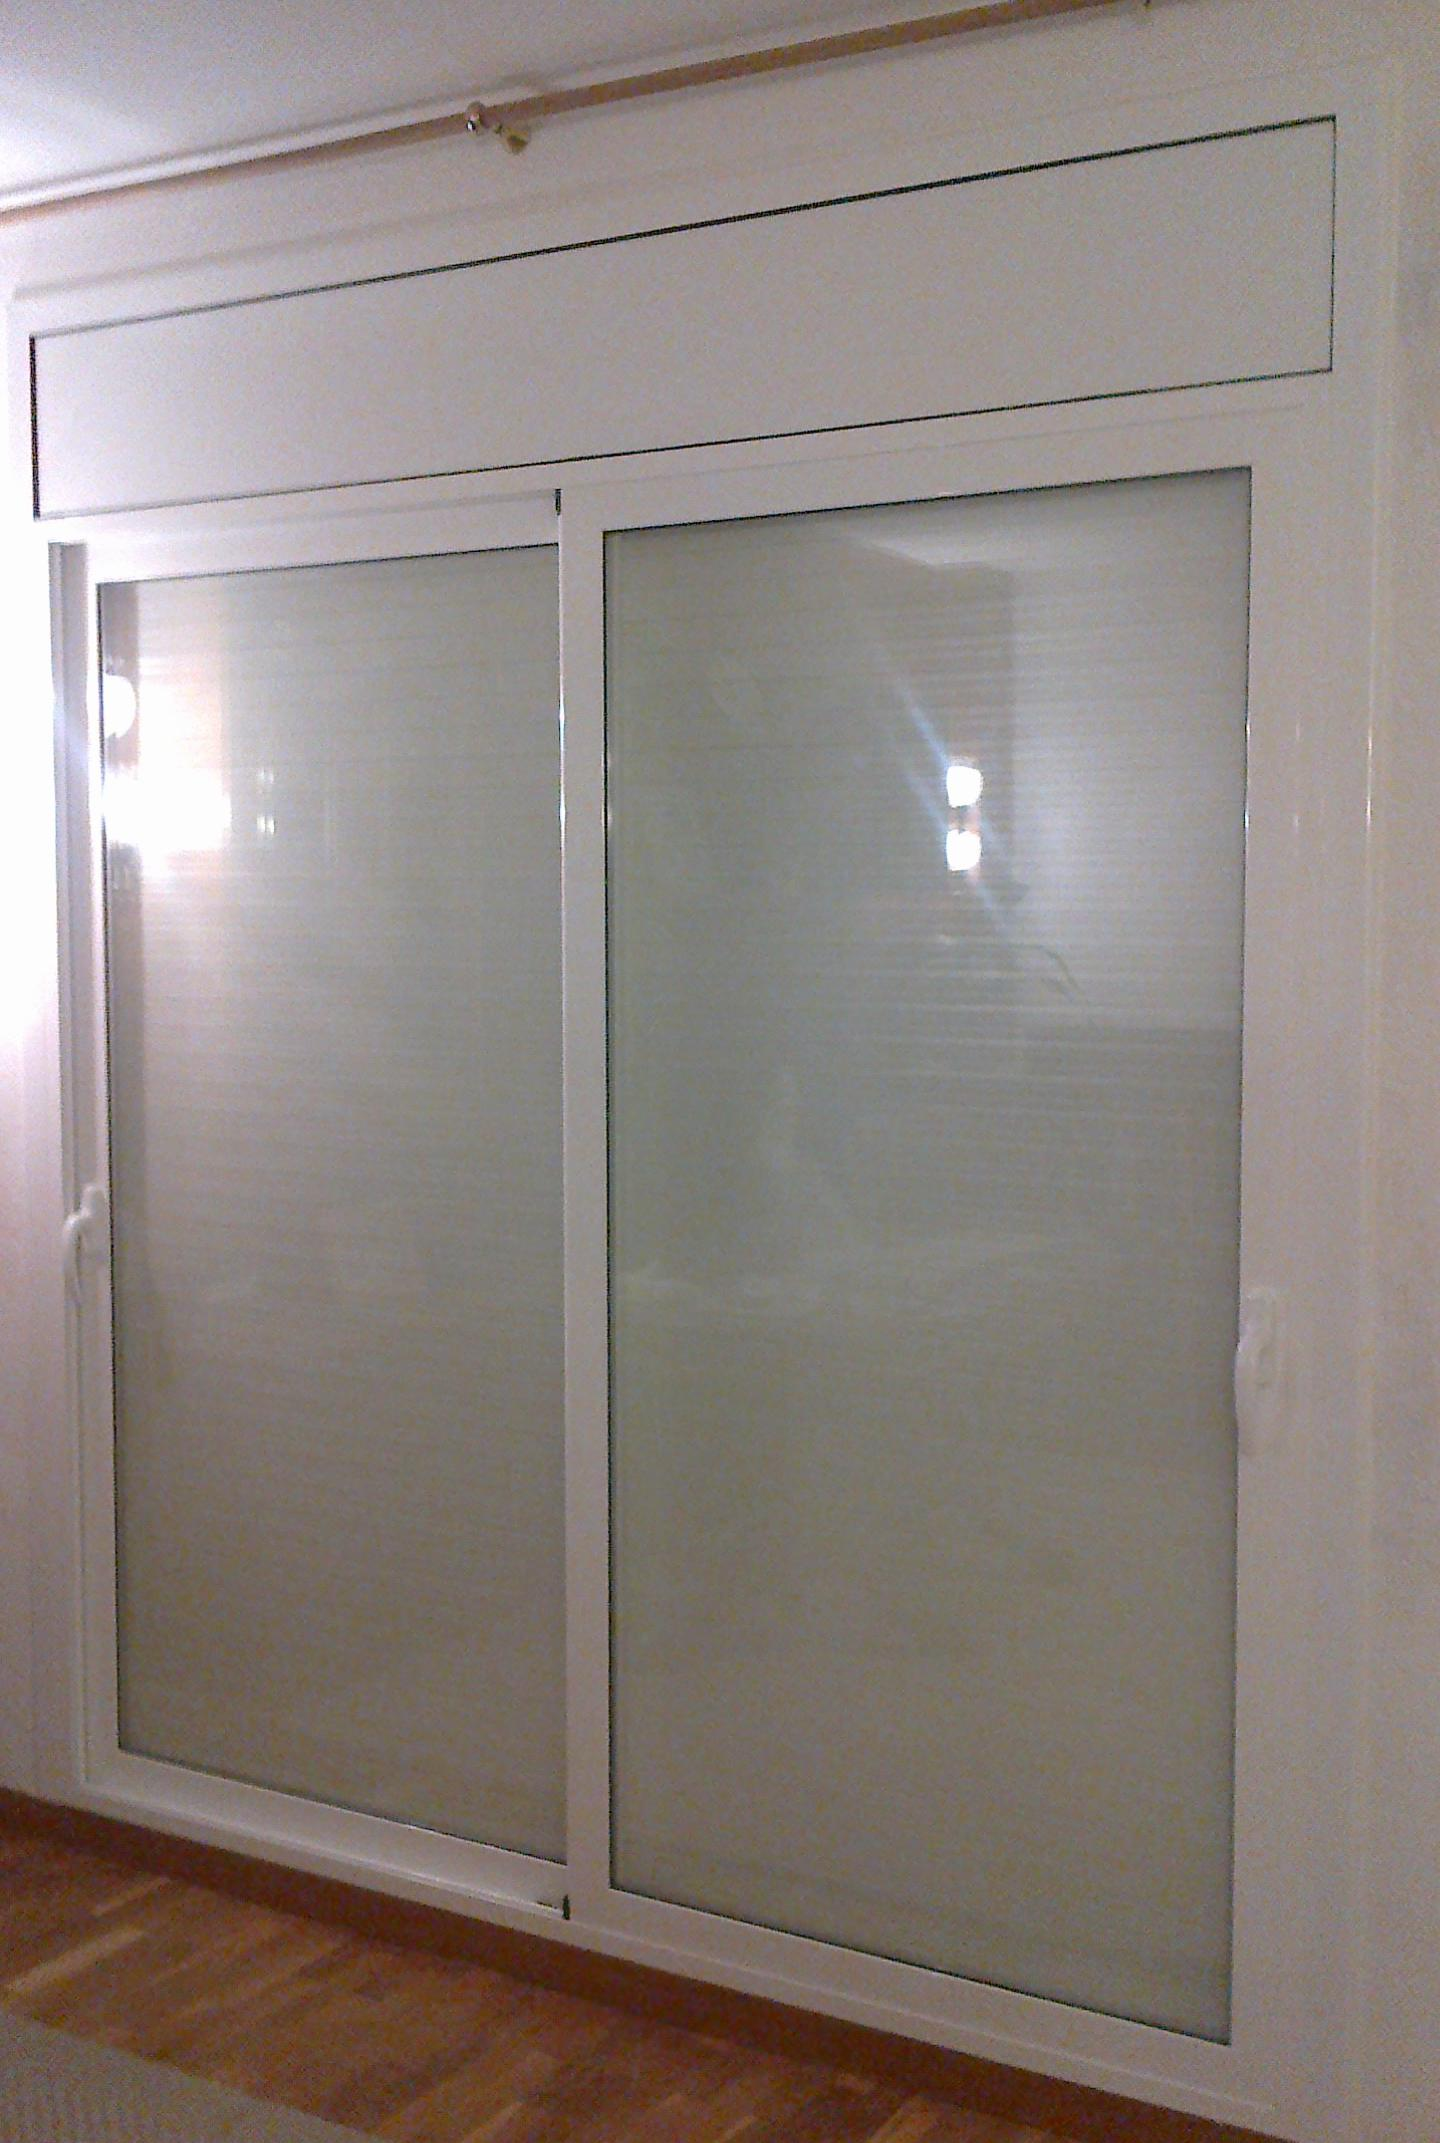 Puerta corredera de aluminio cat logo de vicar for Catalogo puertas aluminio